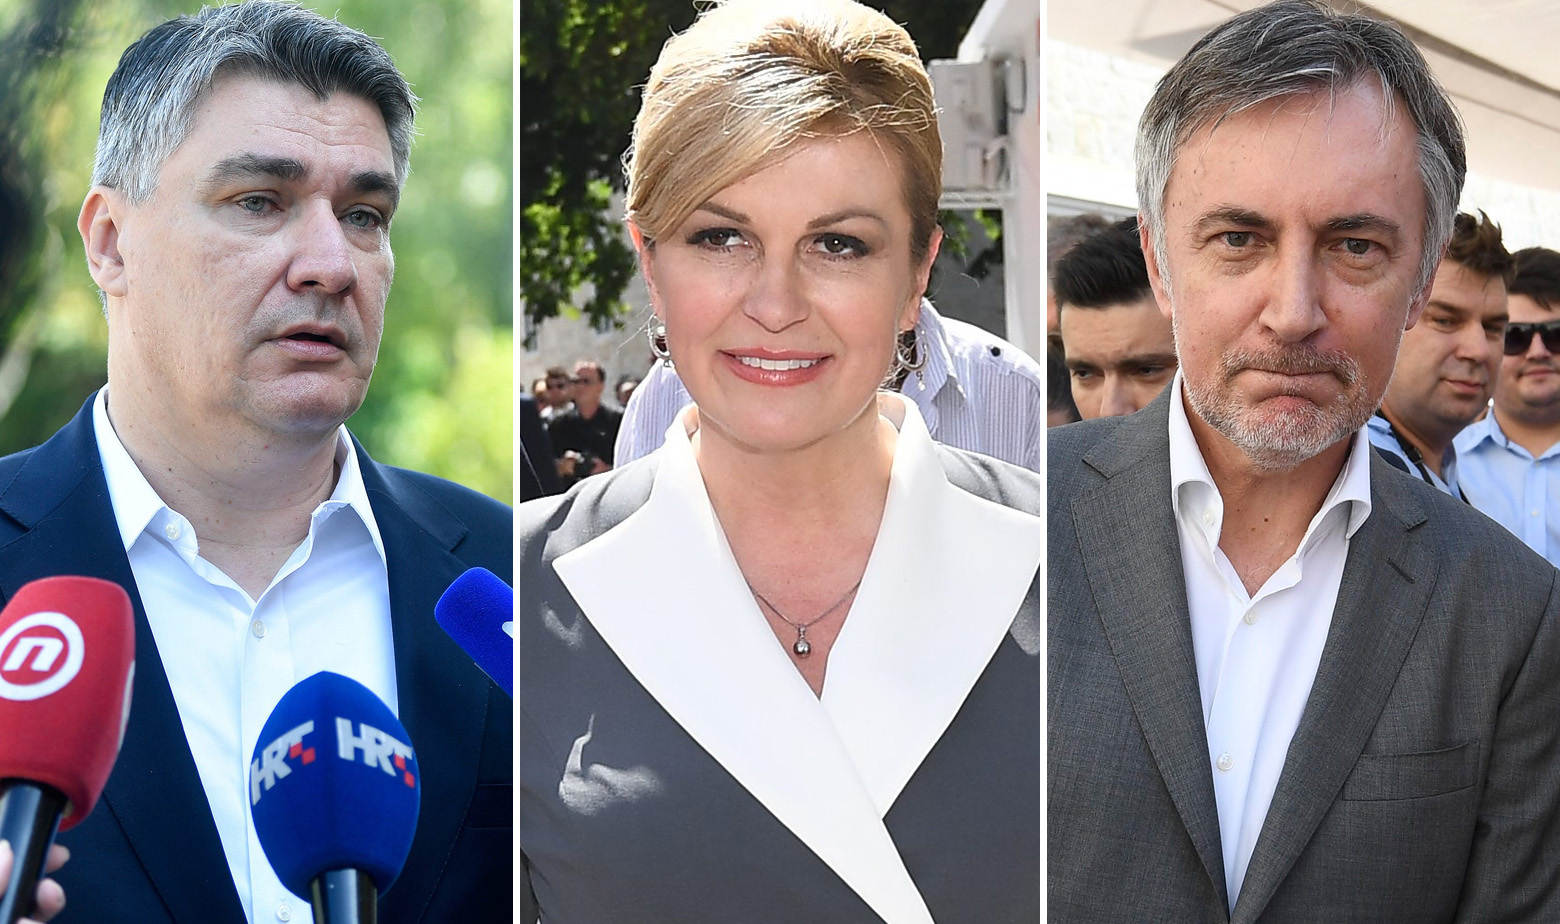 Zoran Milanović, Kolinda Grabar Kitarović i Miroslav Škoro